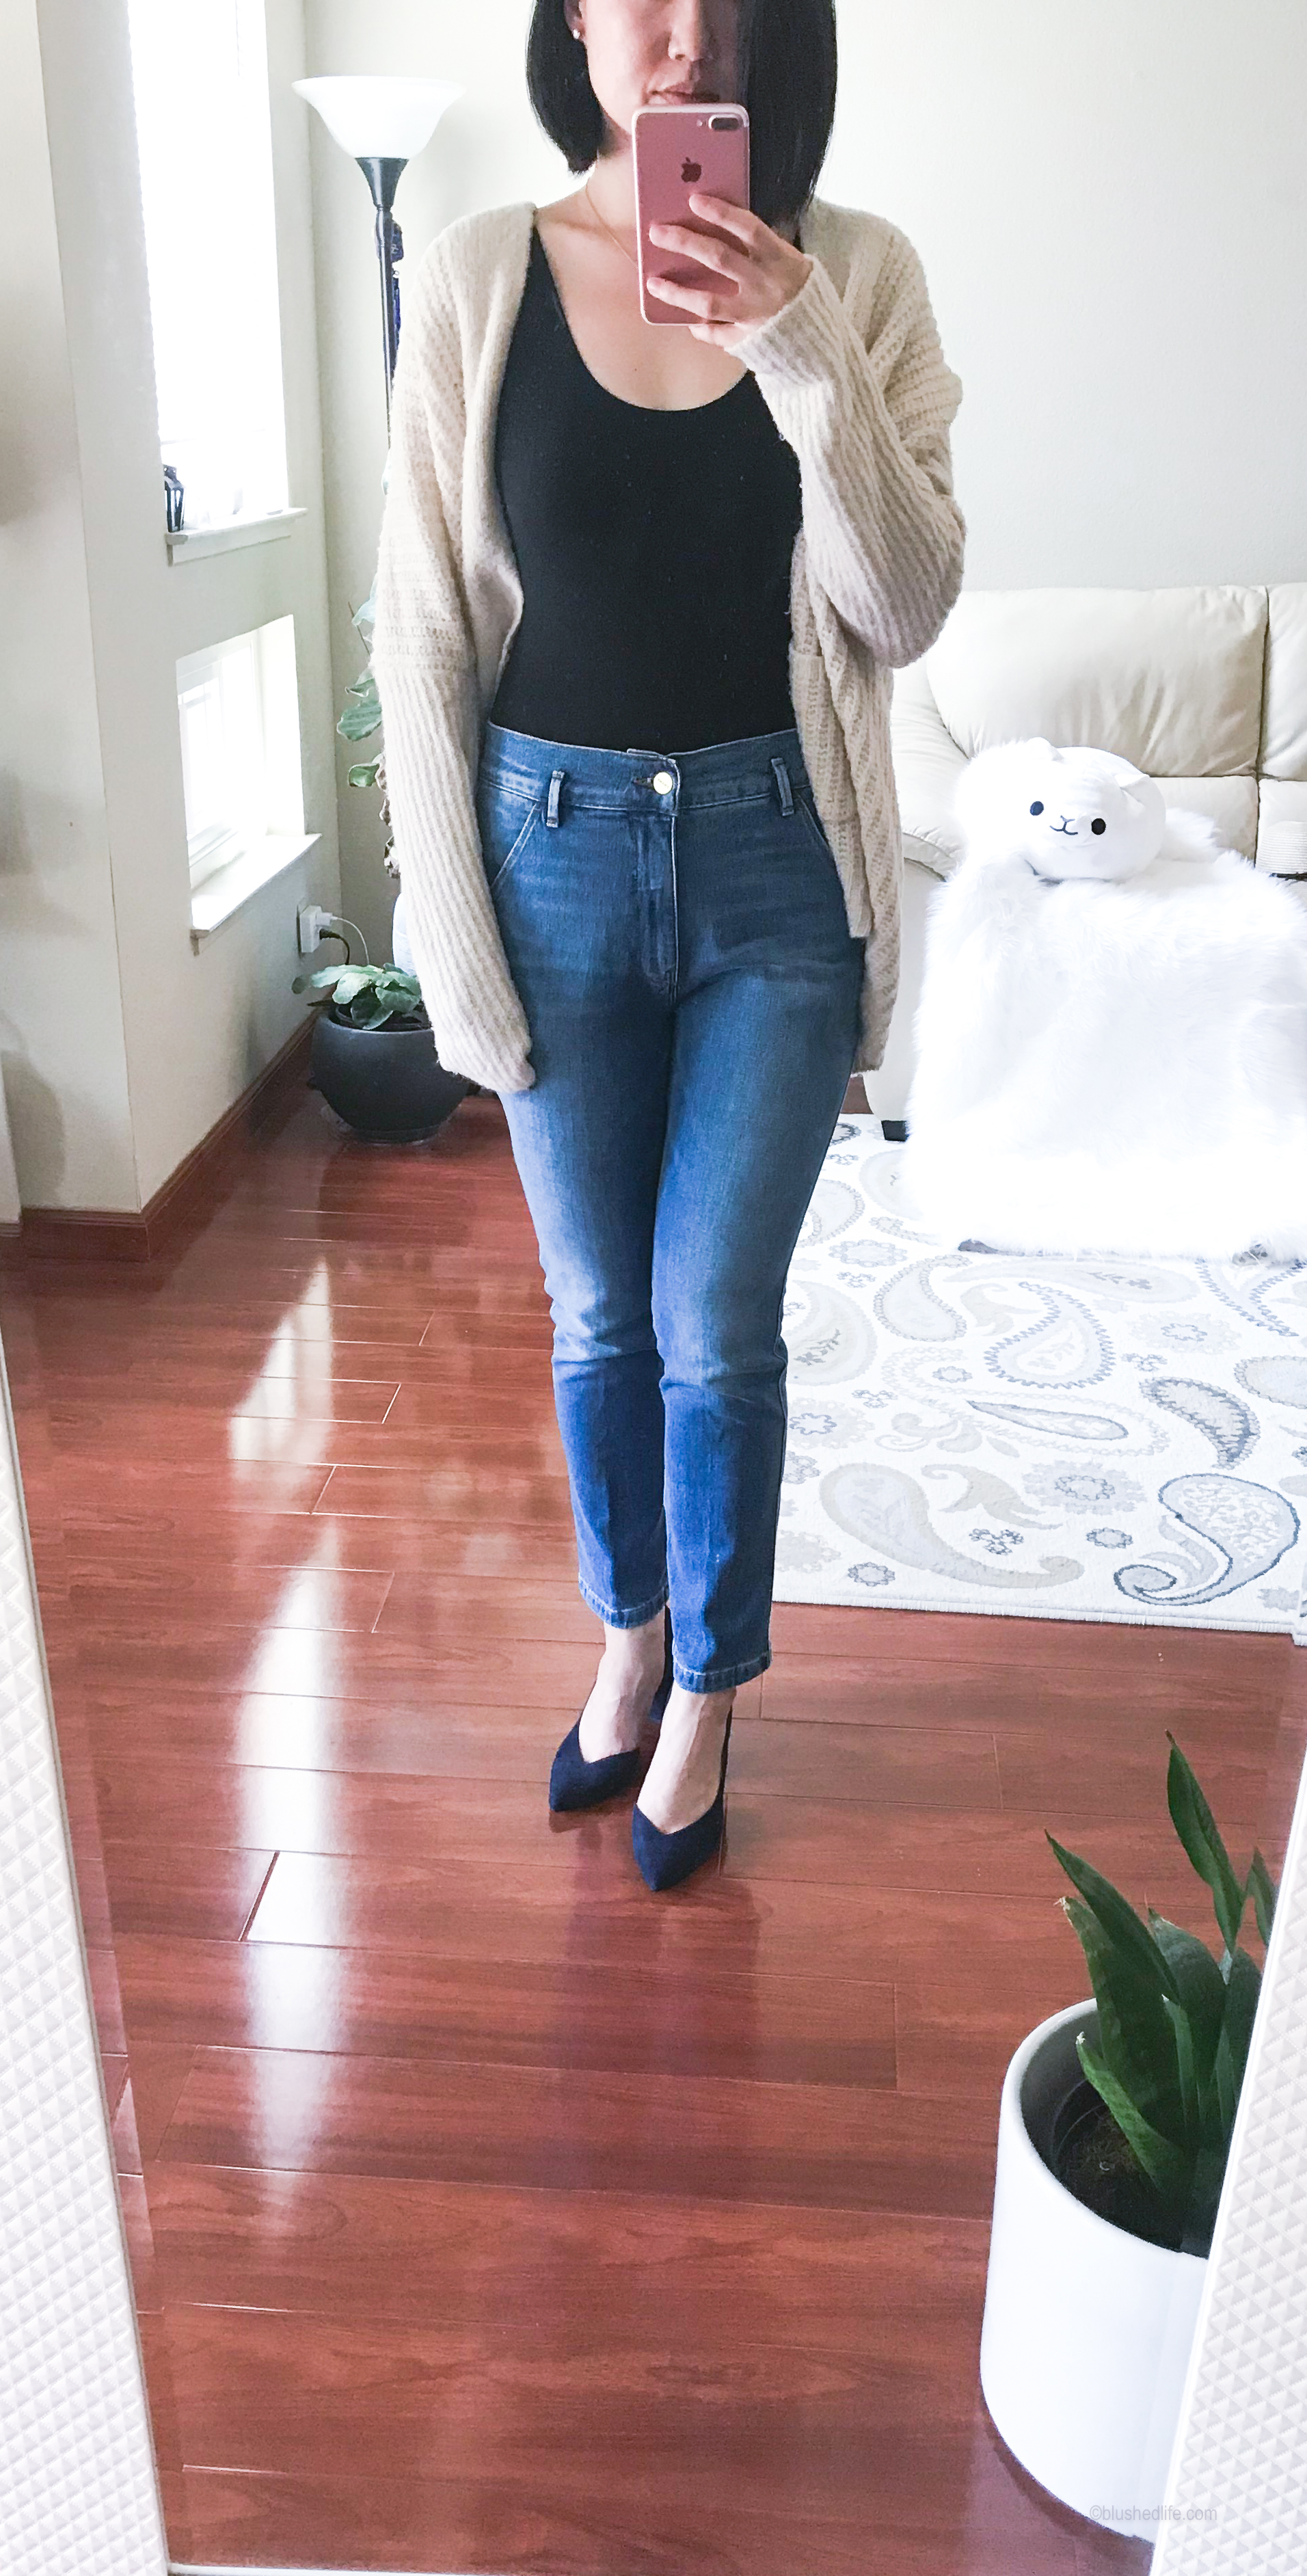 Frame Le Slender Straight Leg Jeans //State Sisteen Half d'Orsay Pump -